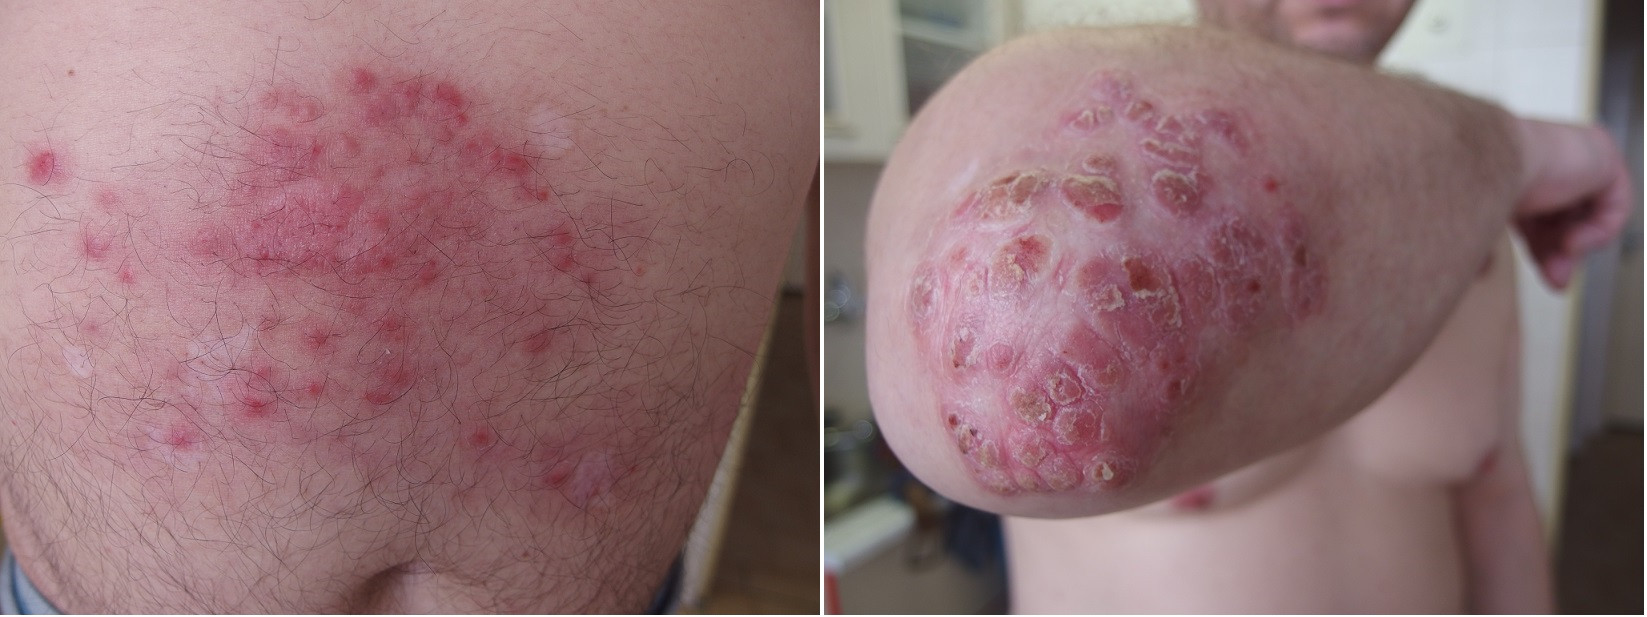 Psoriatická ložiska poté, co pacient neměl dostatek pěny